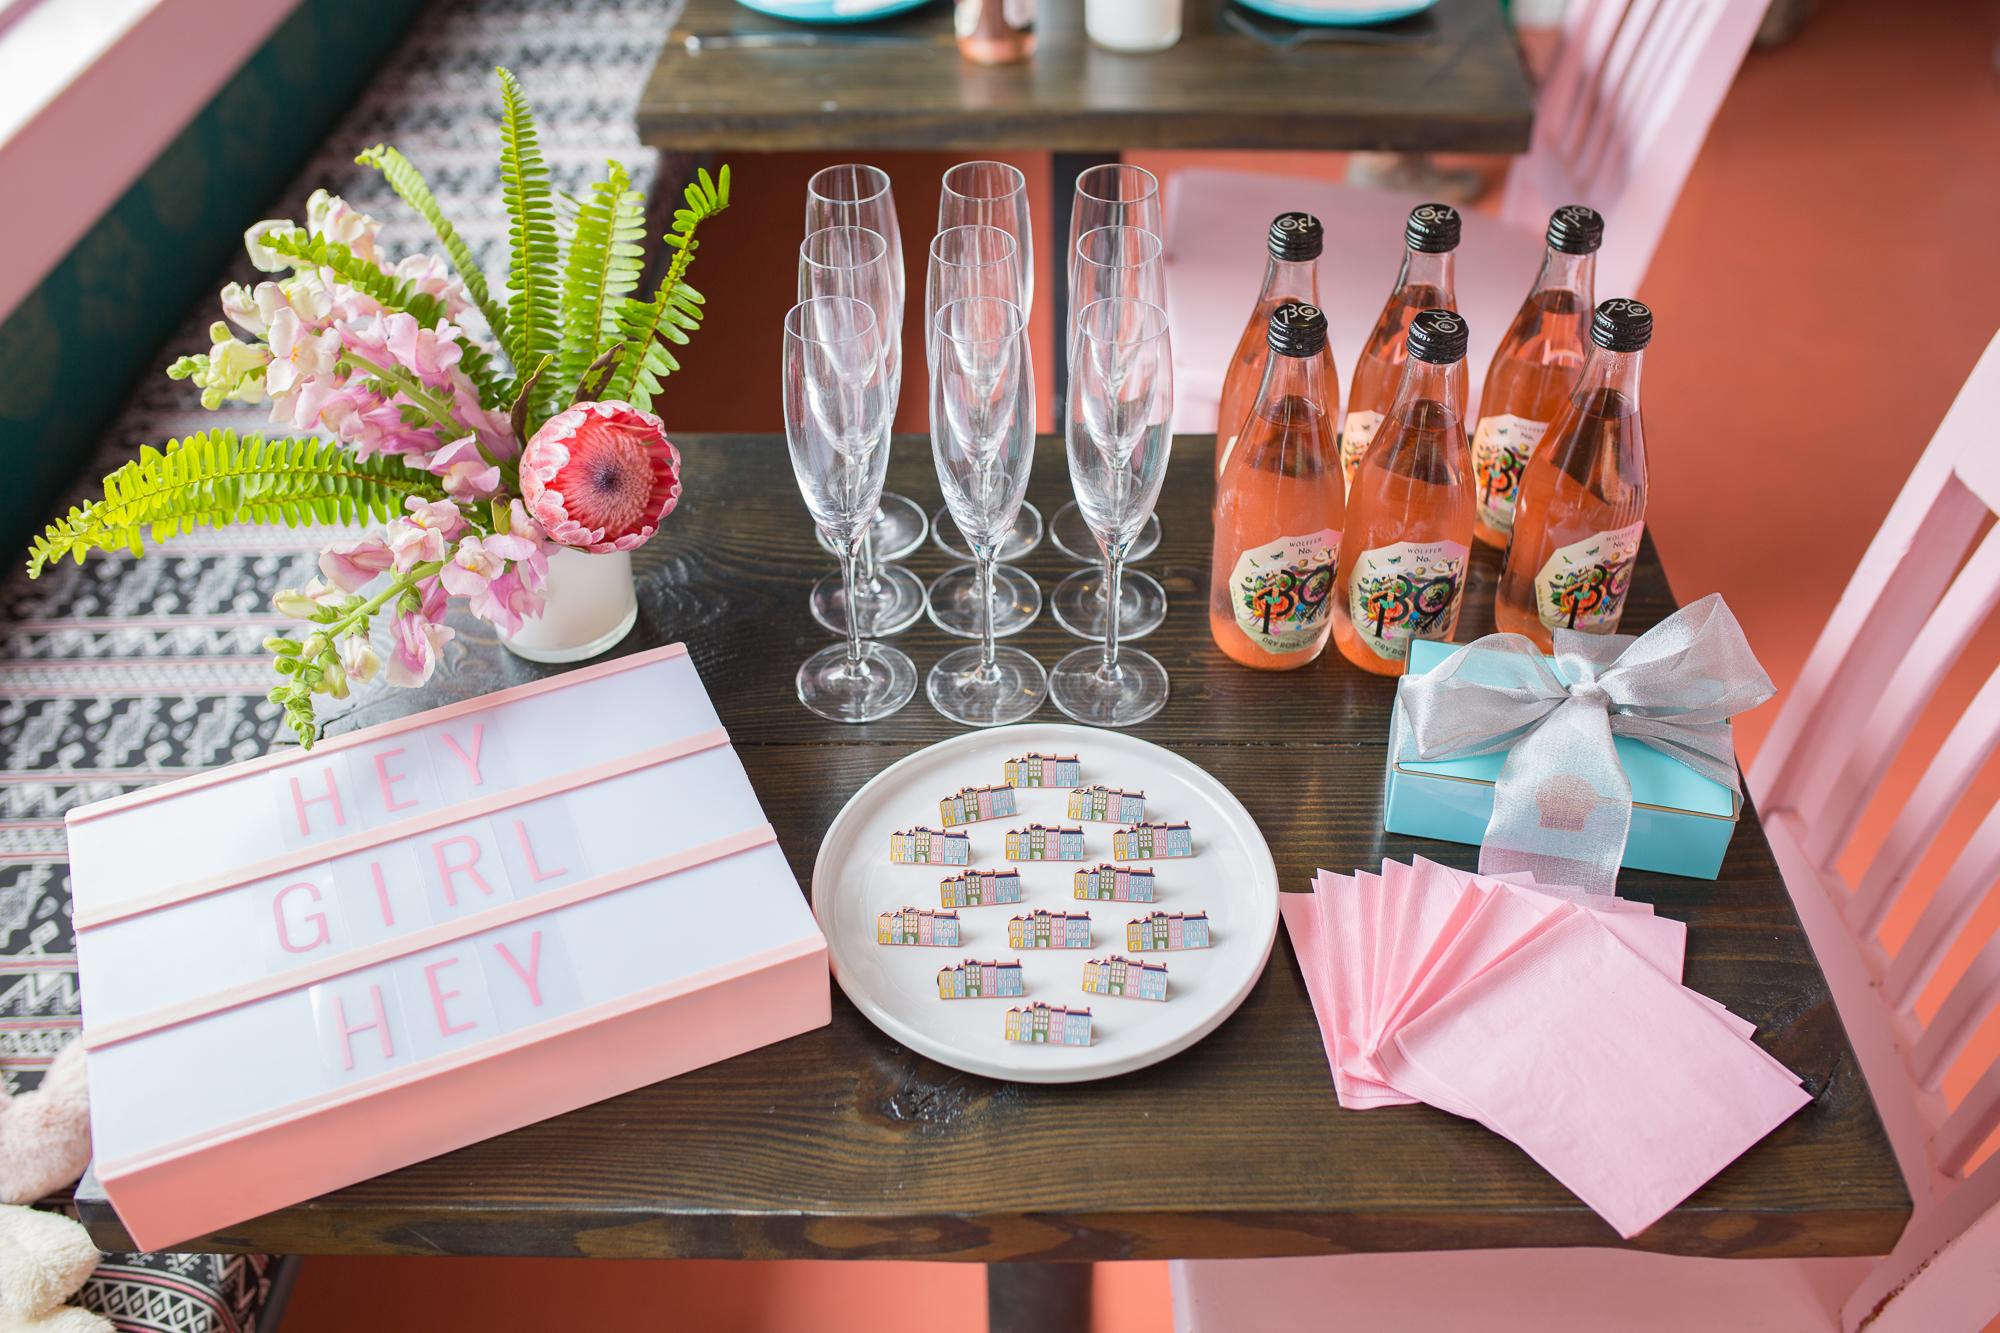 party favor table decor